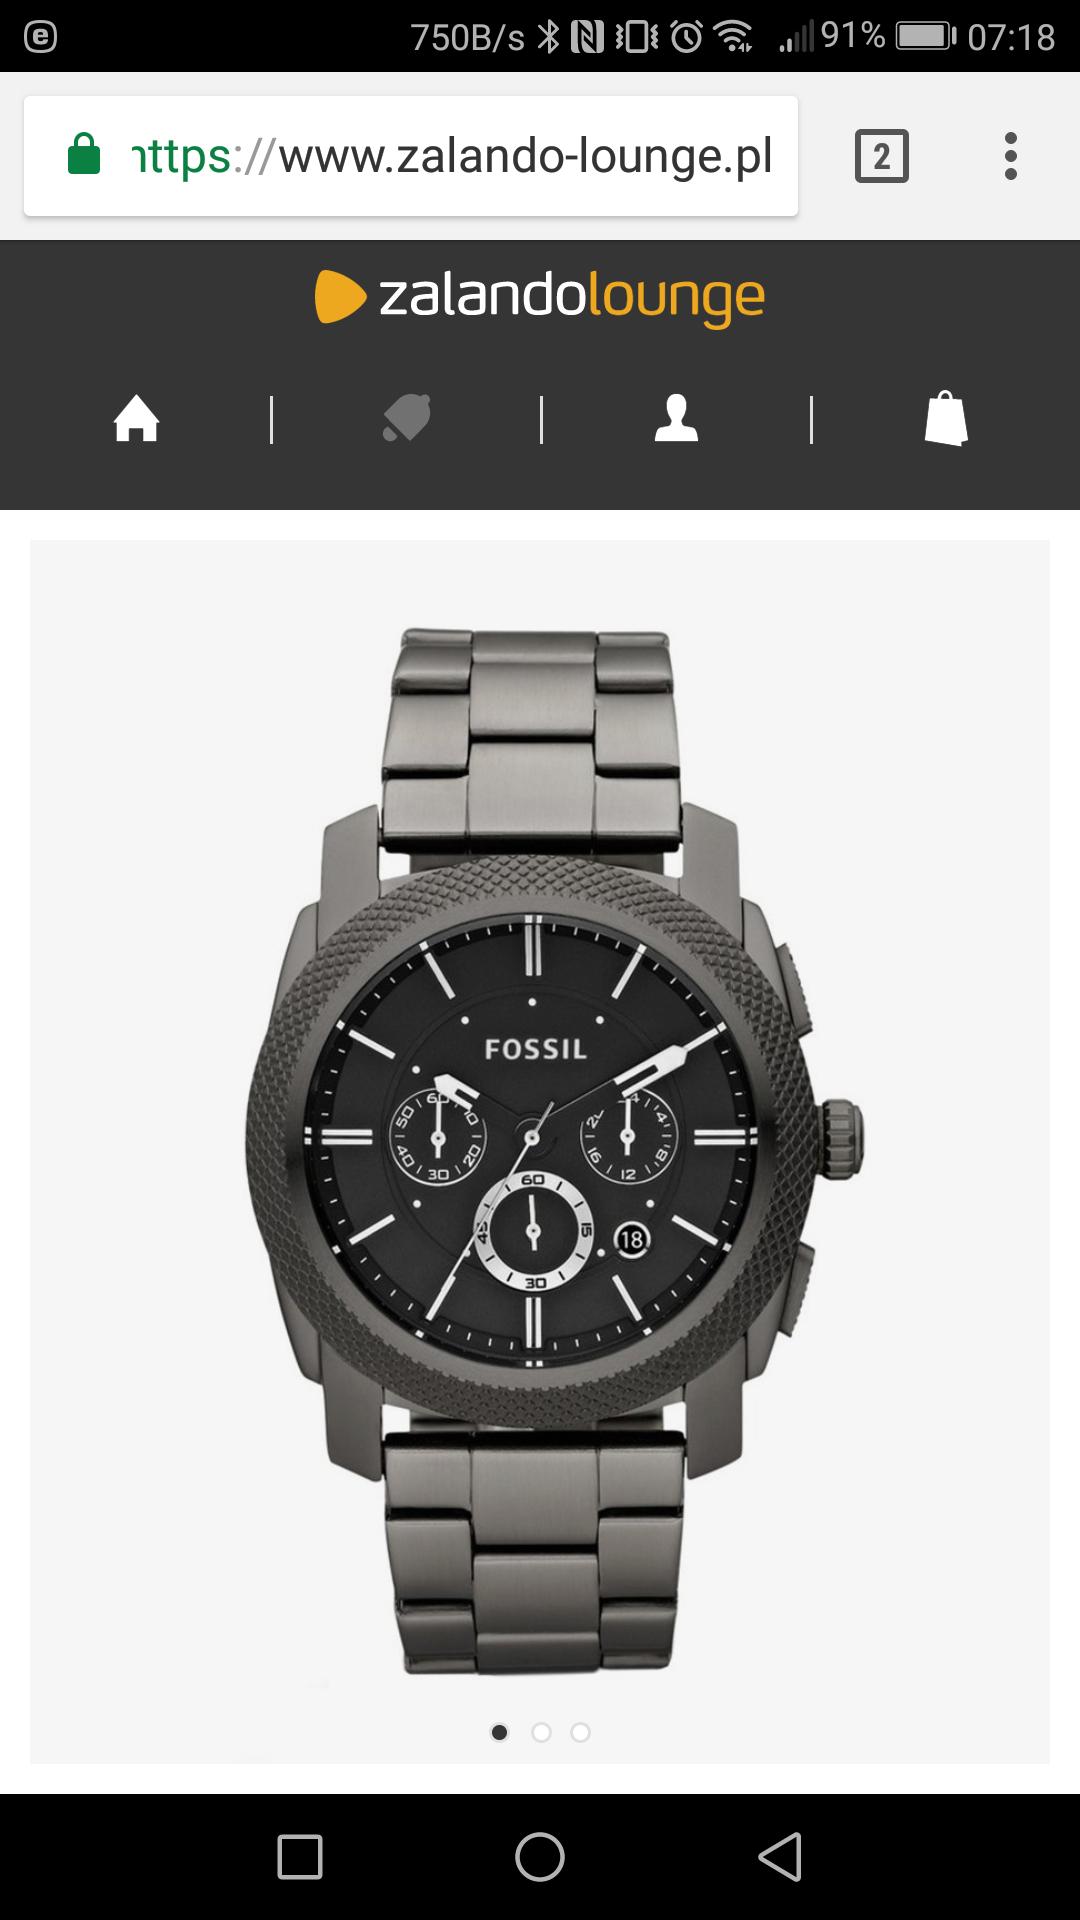 Promocja na zegarki Fossil na Zalando Lounge